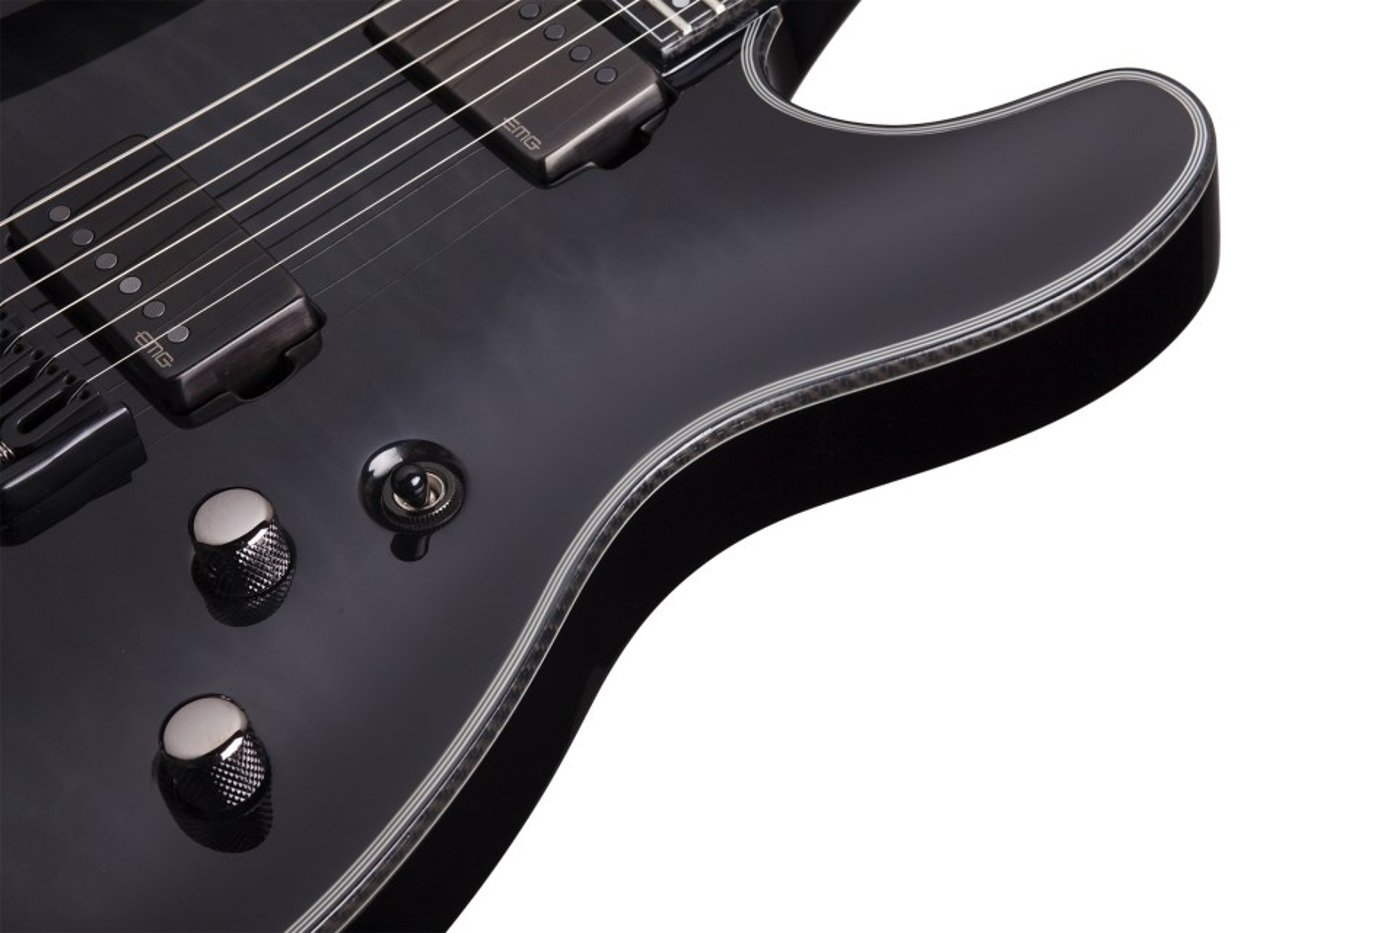 Electric Guitar, Trans Black Burst Finish